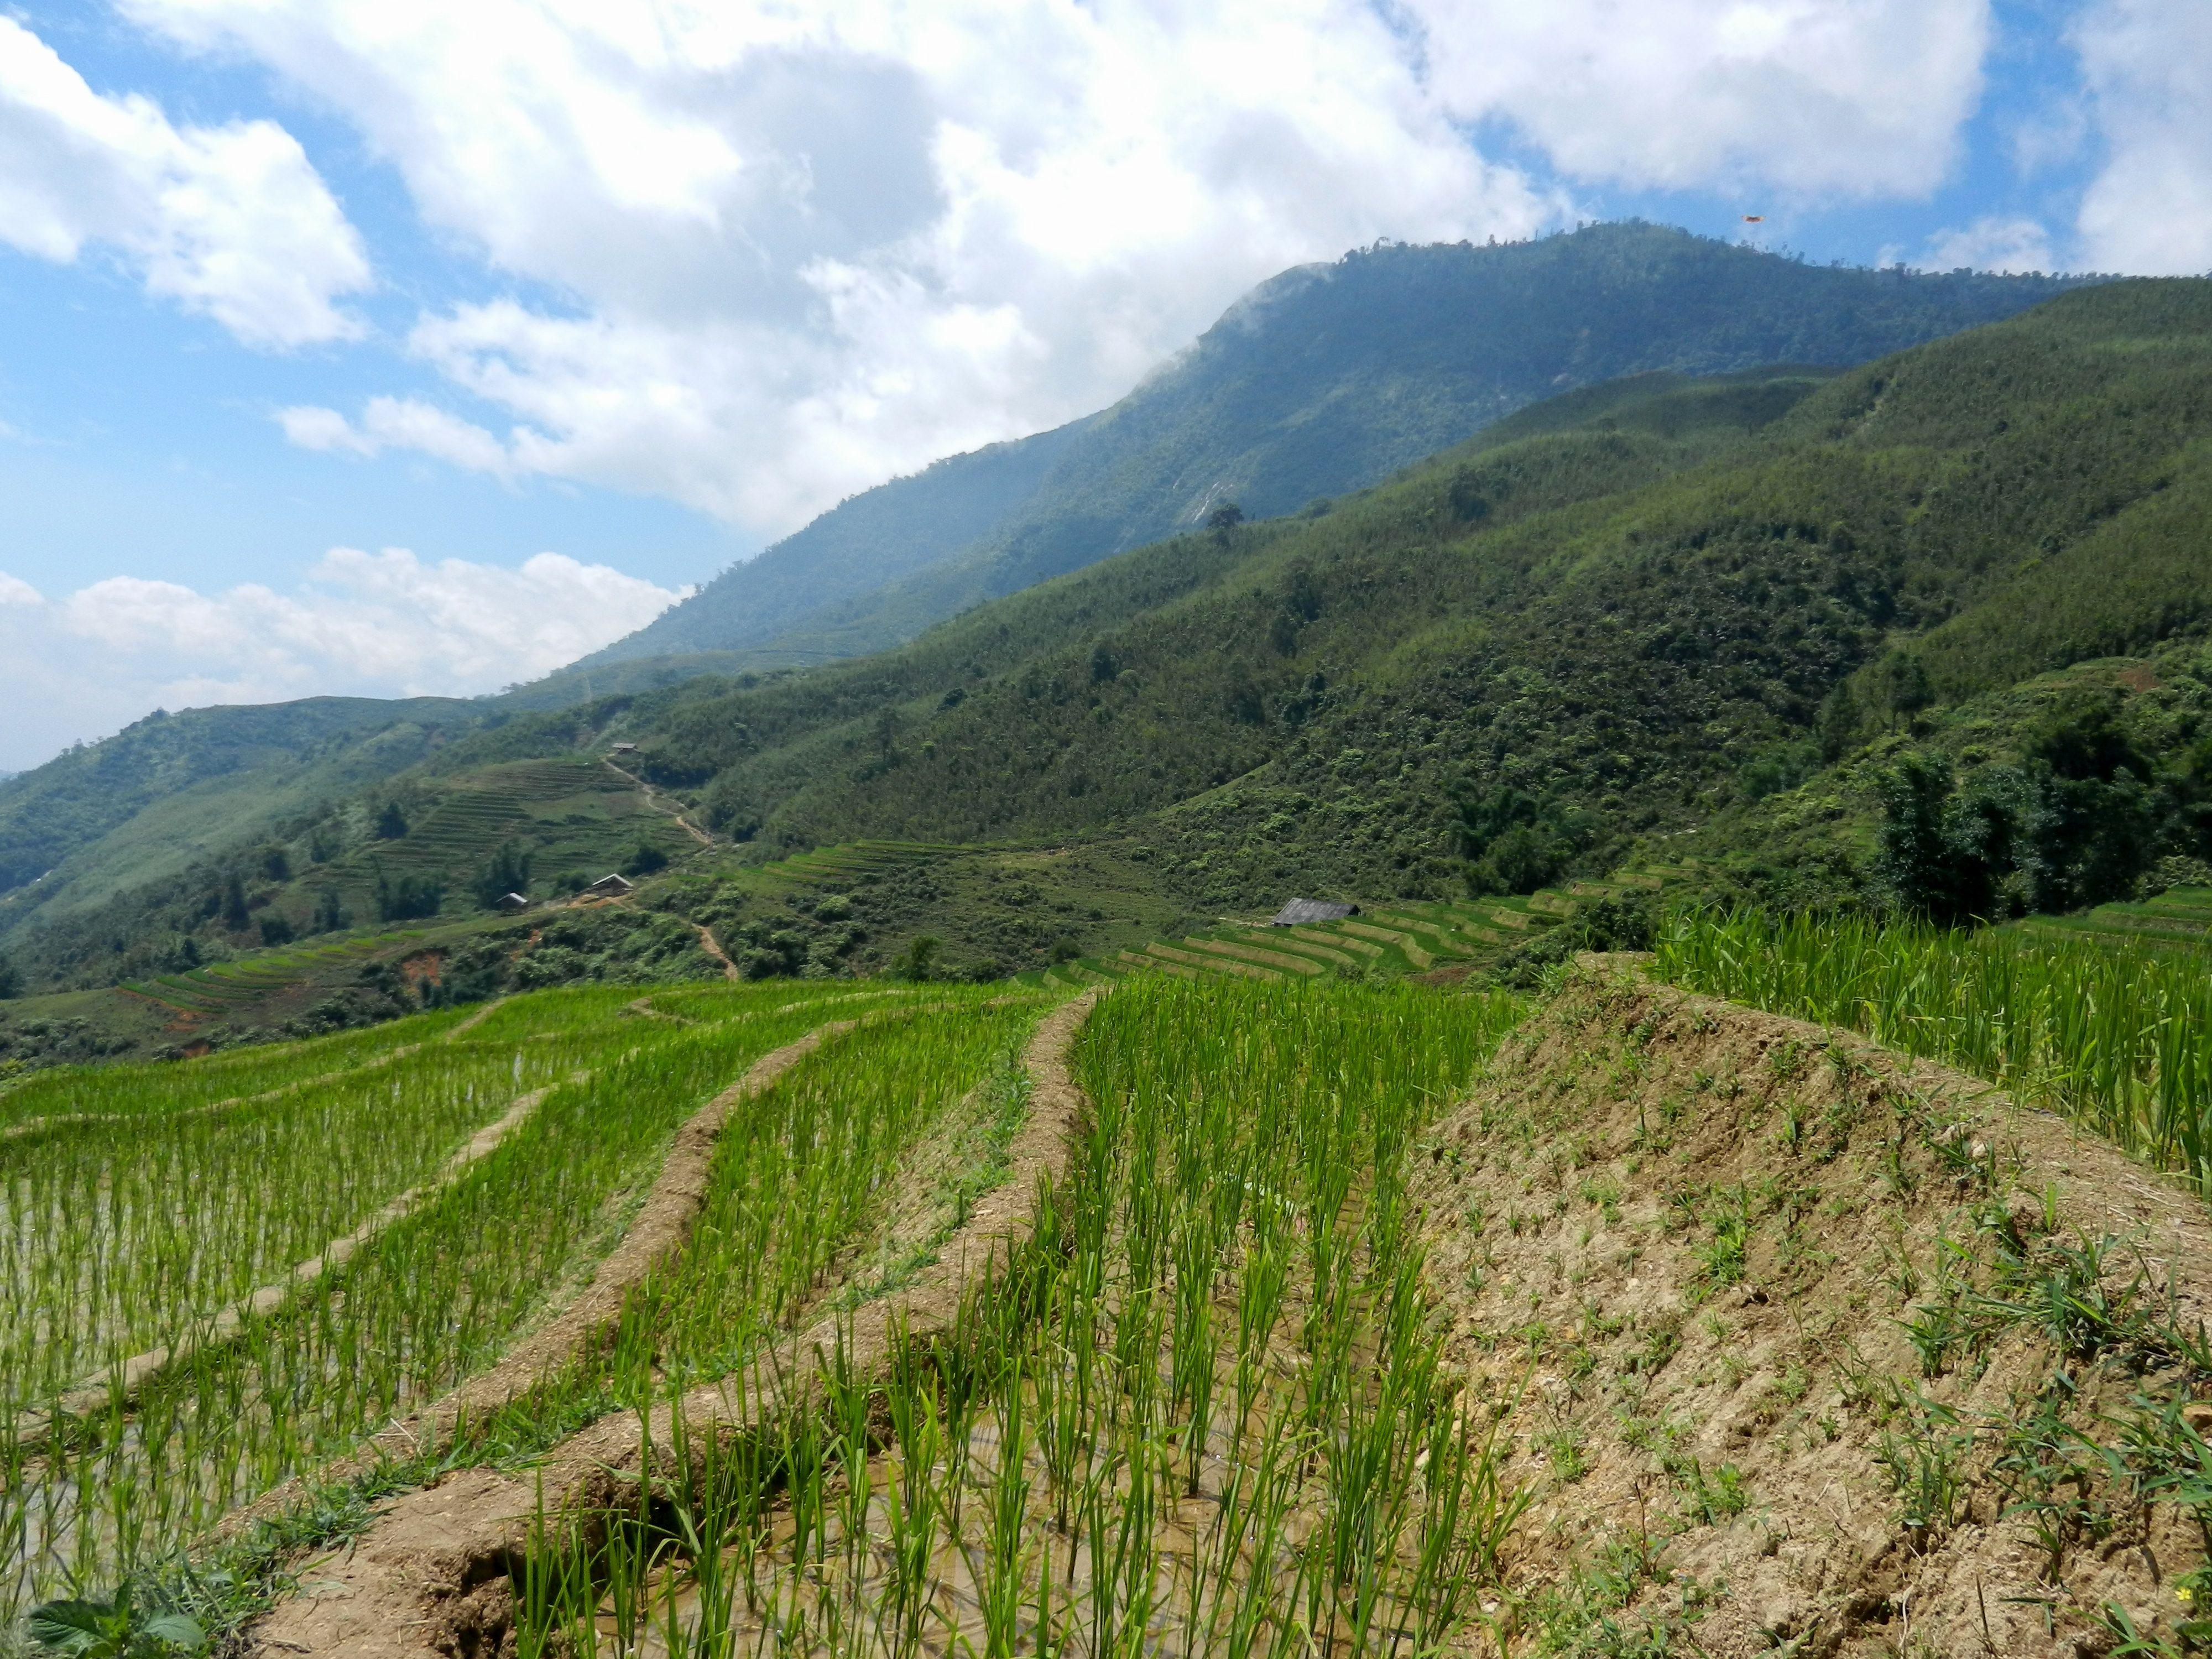 Rice fields of Sa Pa, Vietnam